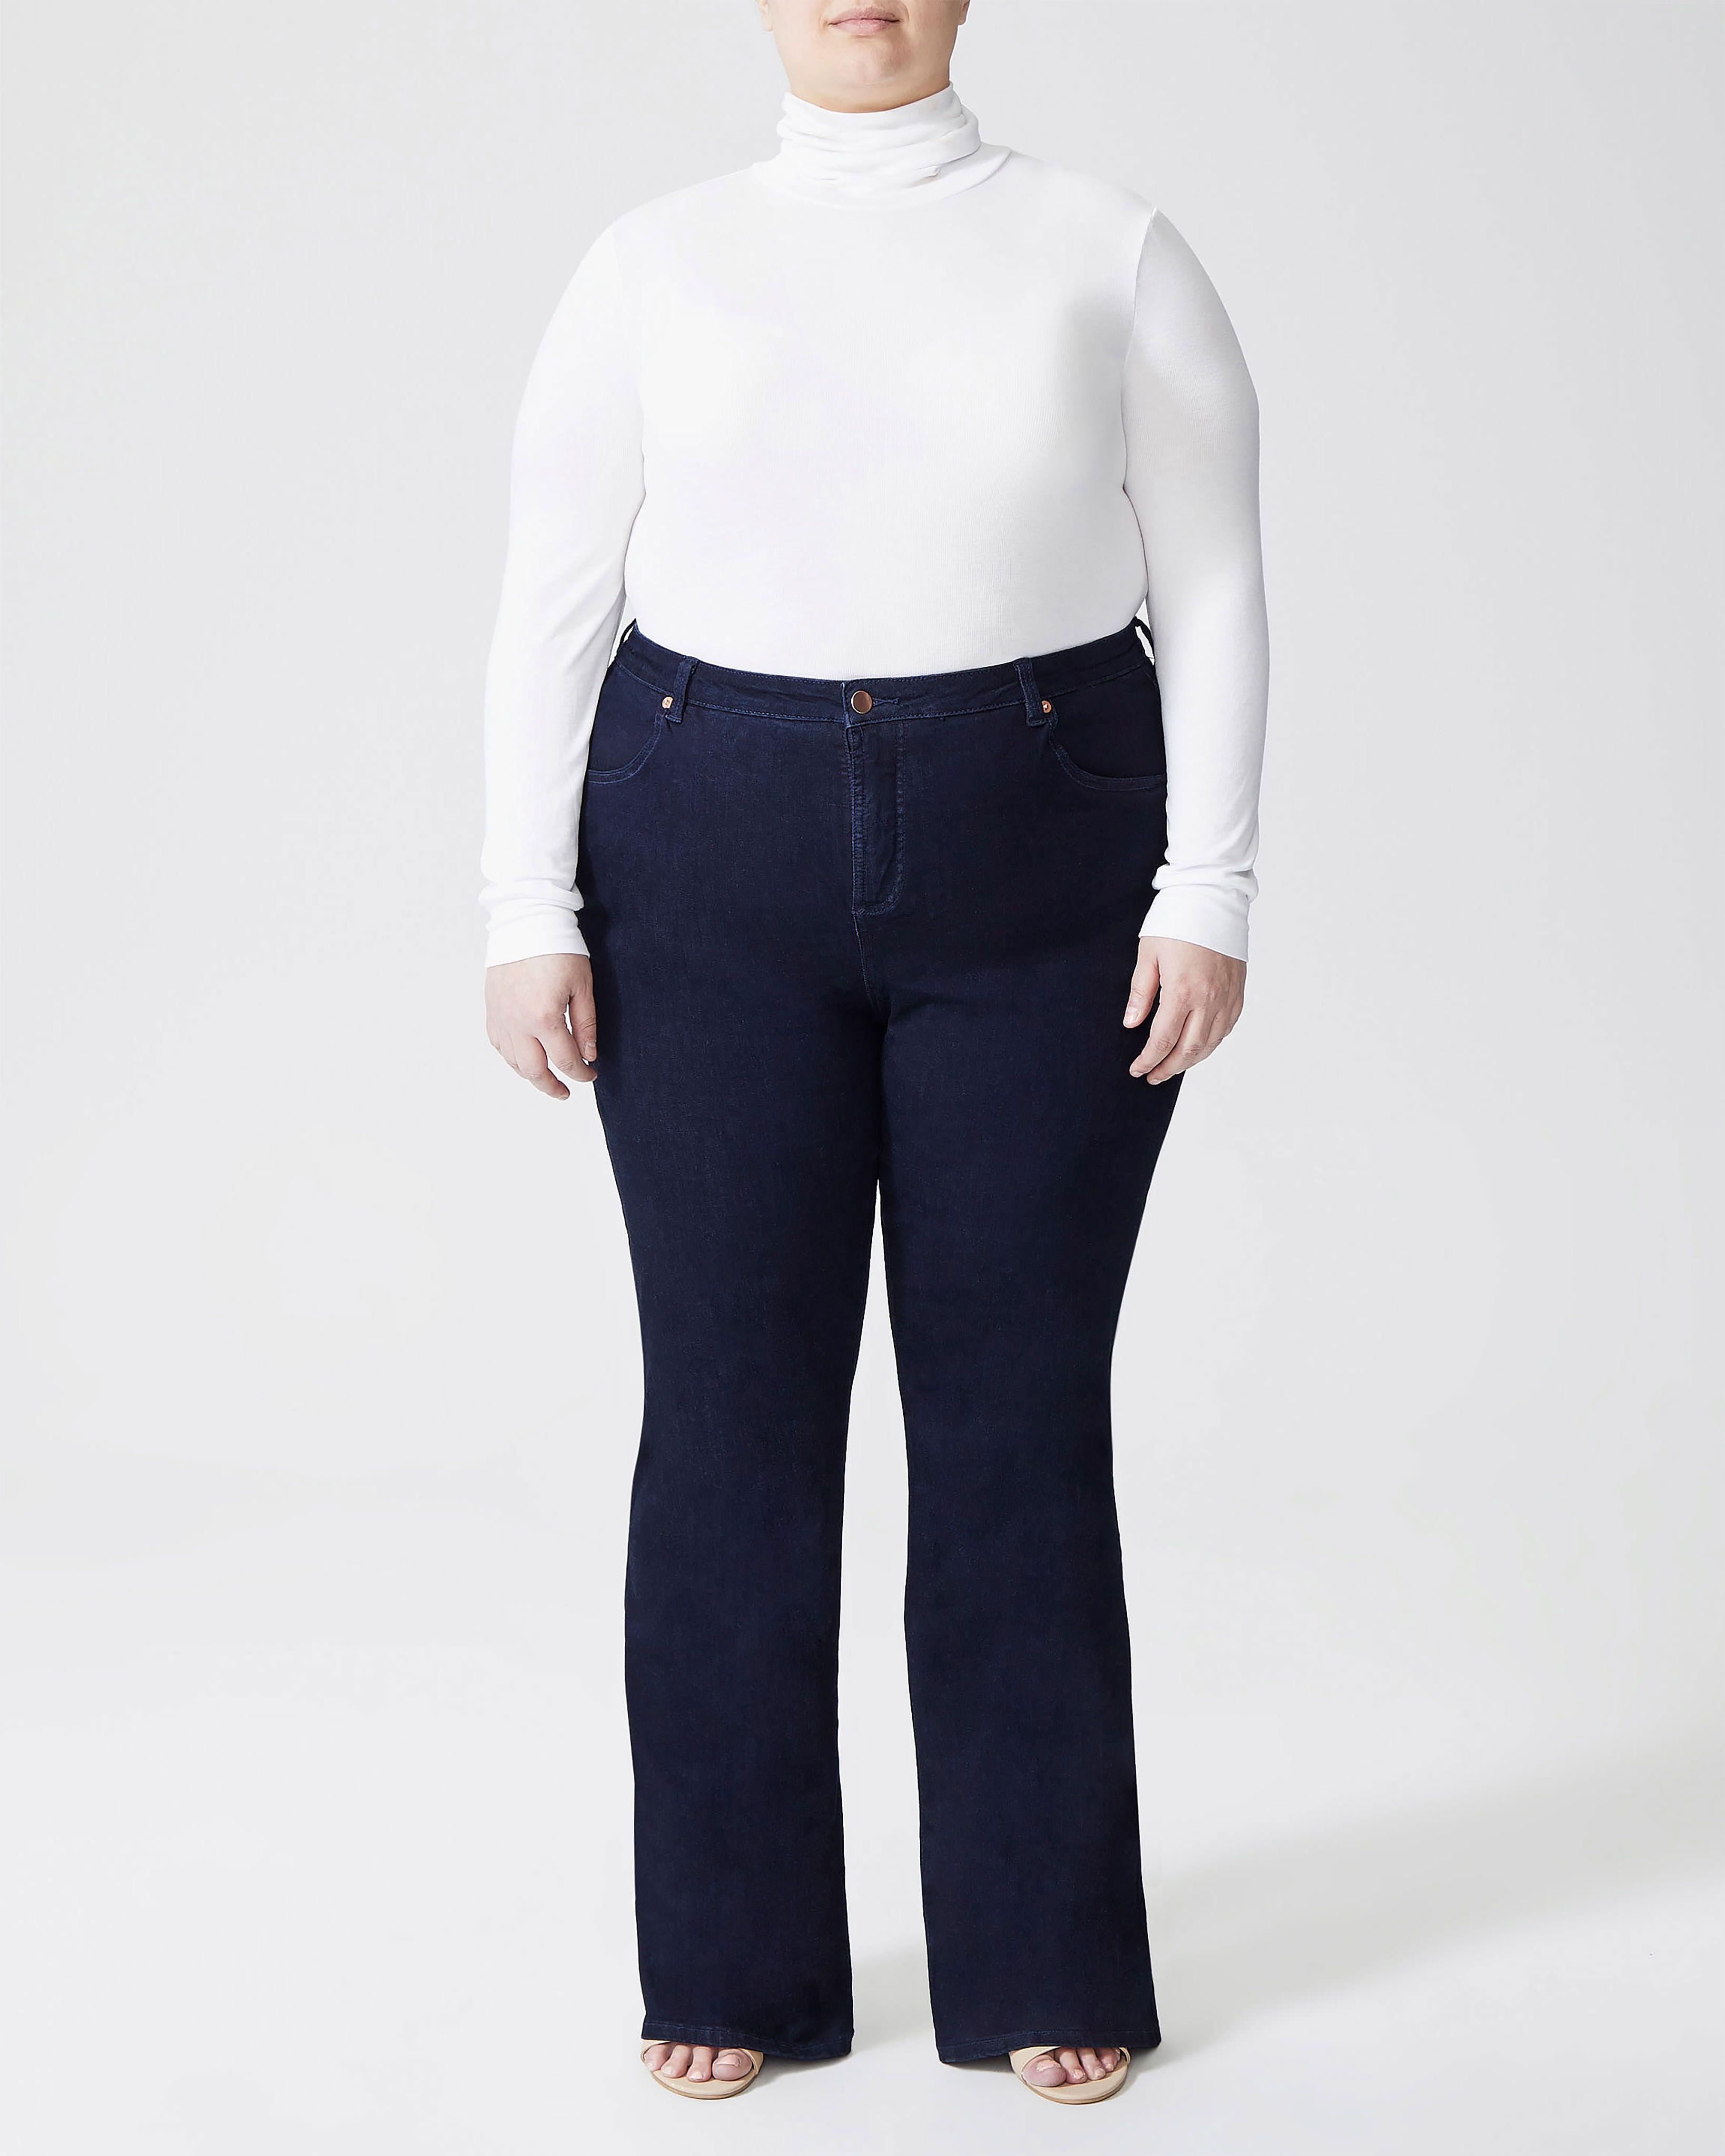 Sava High Rise Flare Jeans - Dark Indigo